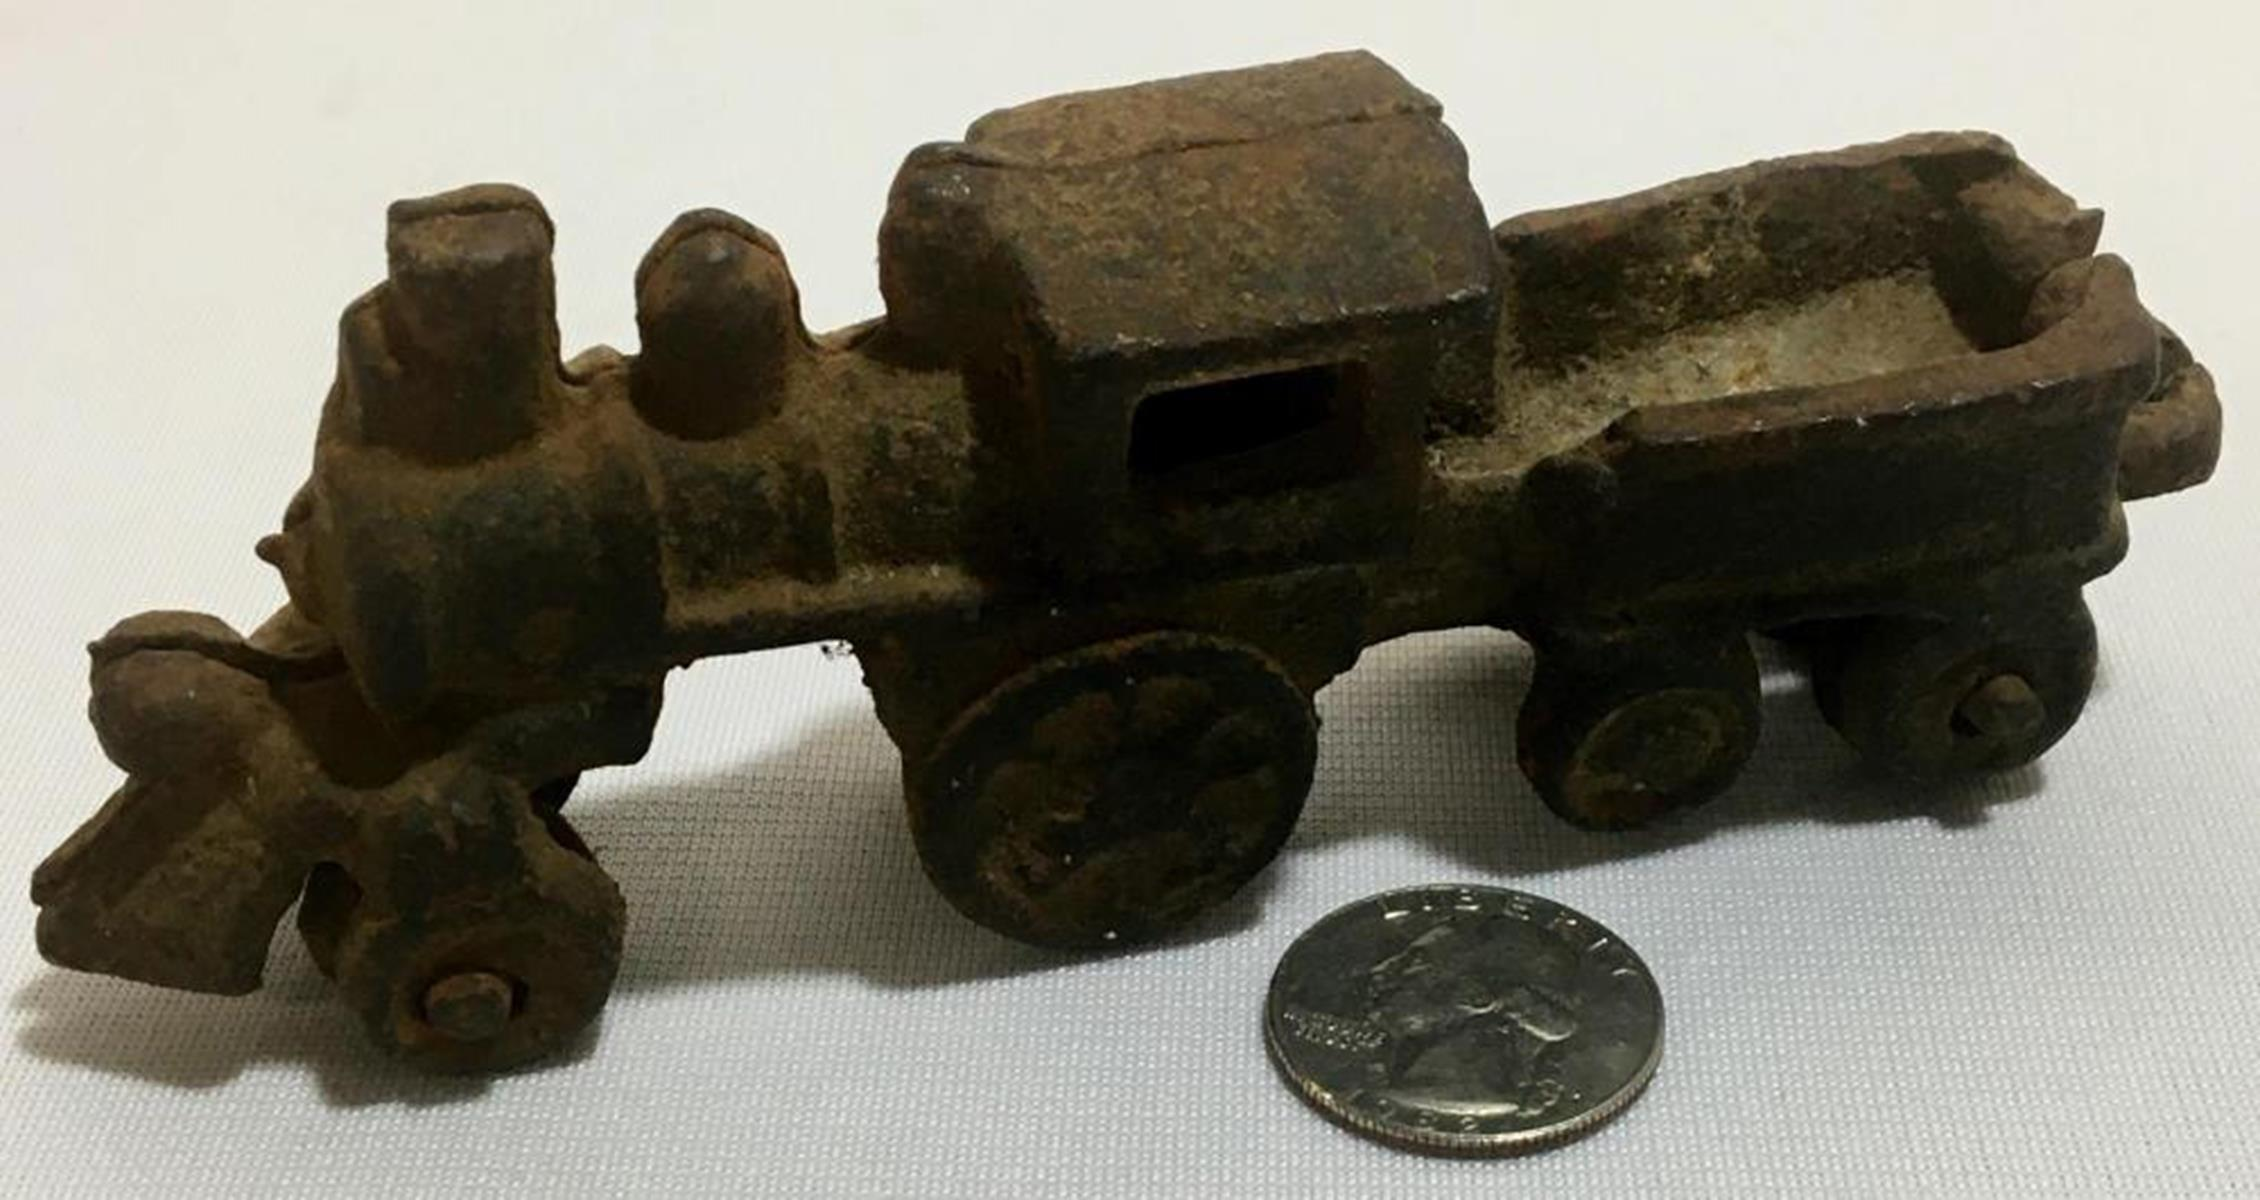 RARE Antique Cast Iron Locomotive and Connected Coal Car